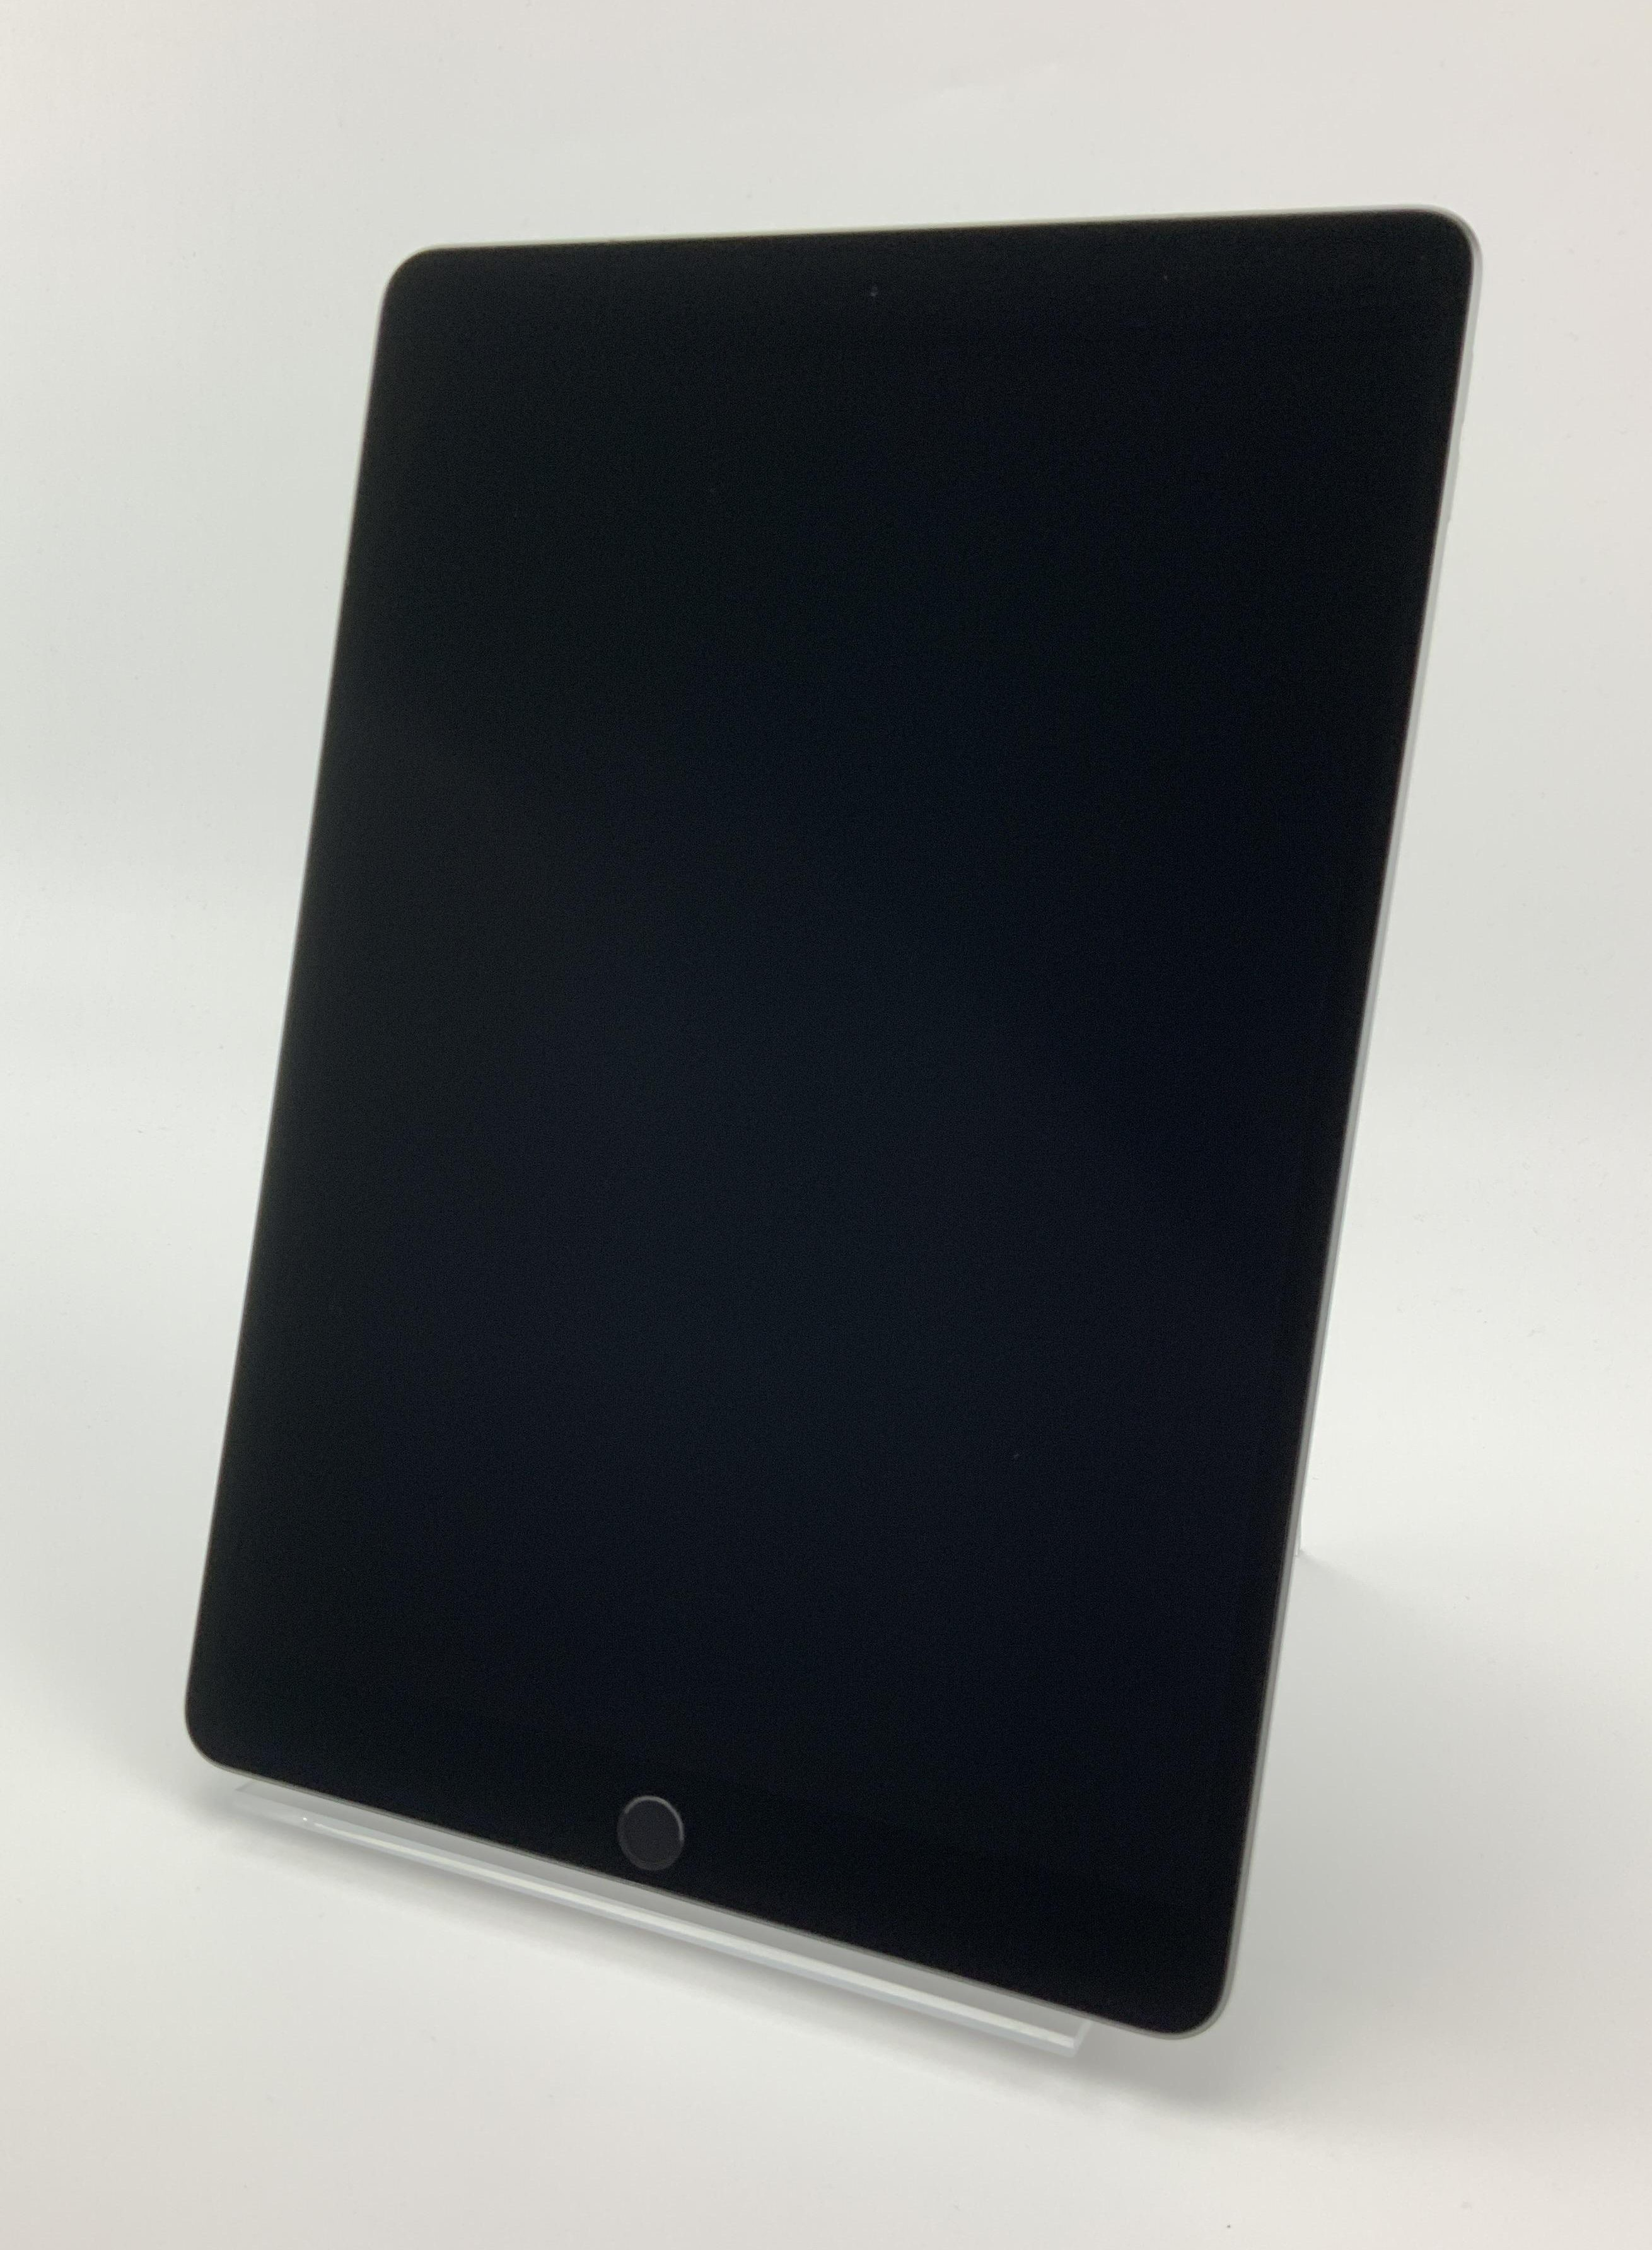 iPad Air 3 Wi-Fi + Cellular 64GB, 64GB, Space Gray, Kuva 1